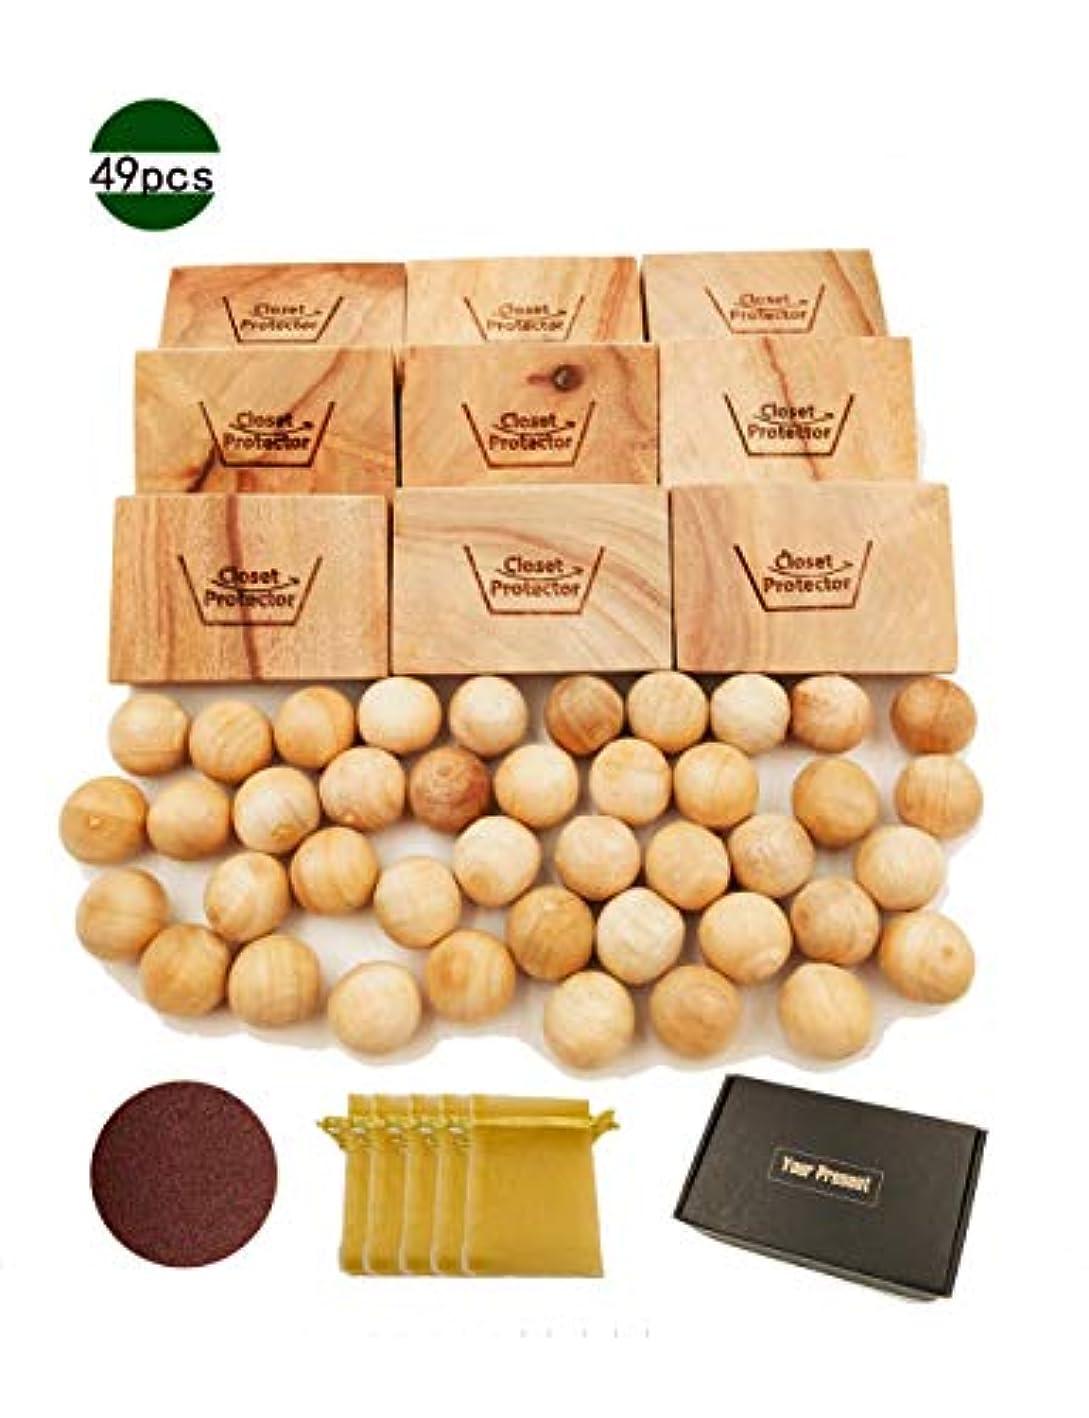 L.M&L.W. Household Essentials Aromatic Blocks Balls Set Alternative Cedar Blocks and Balls Drawer Liners - Pack of 49